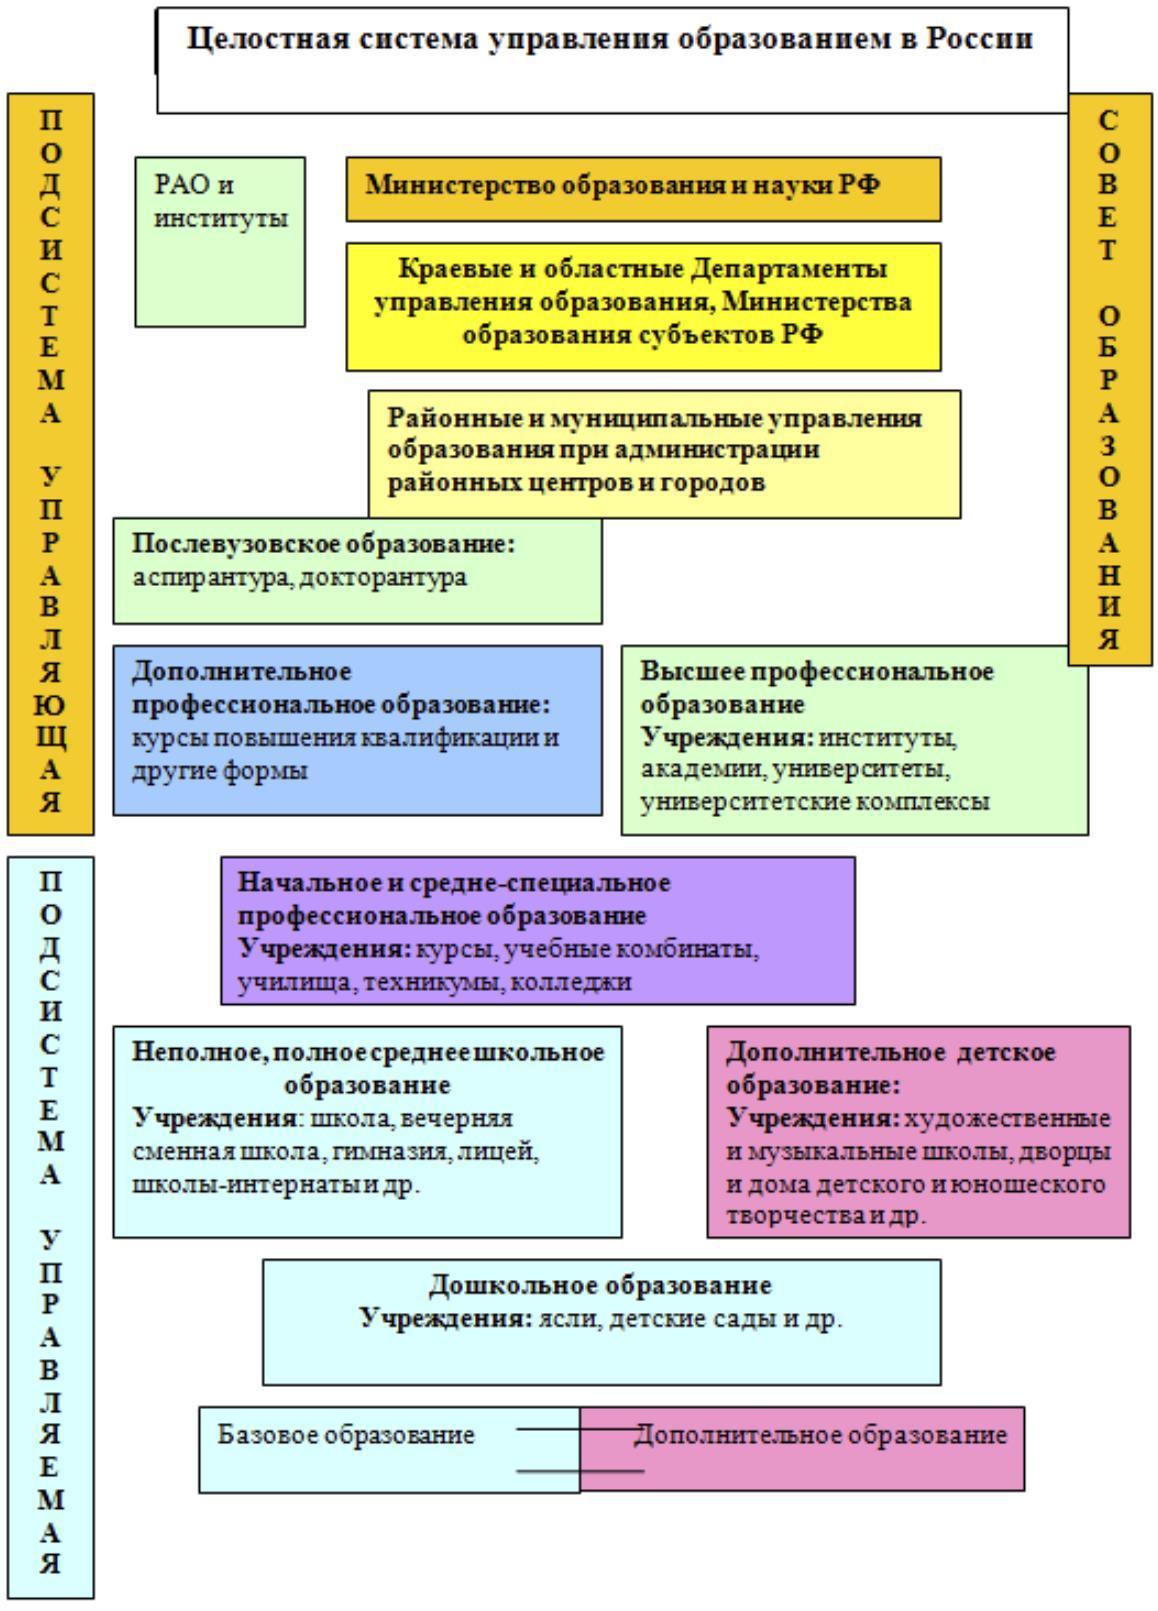 Ключевые параметры системы